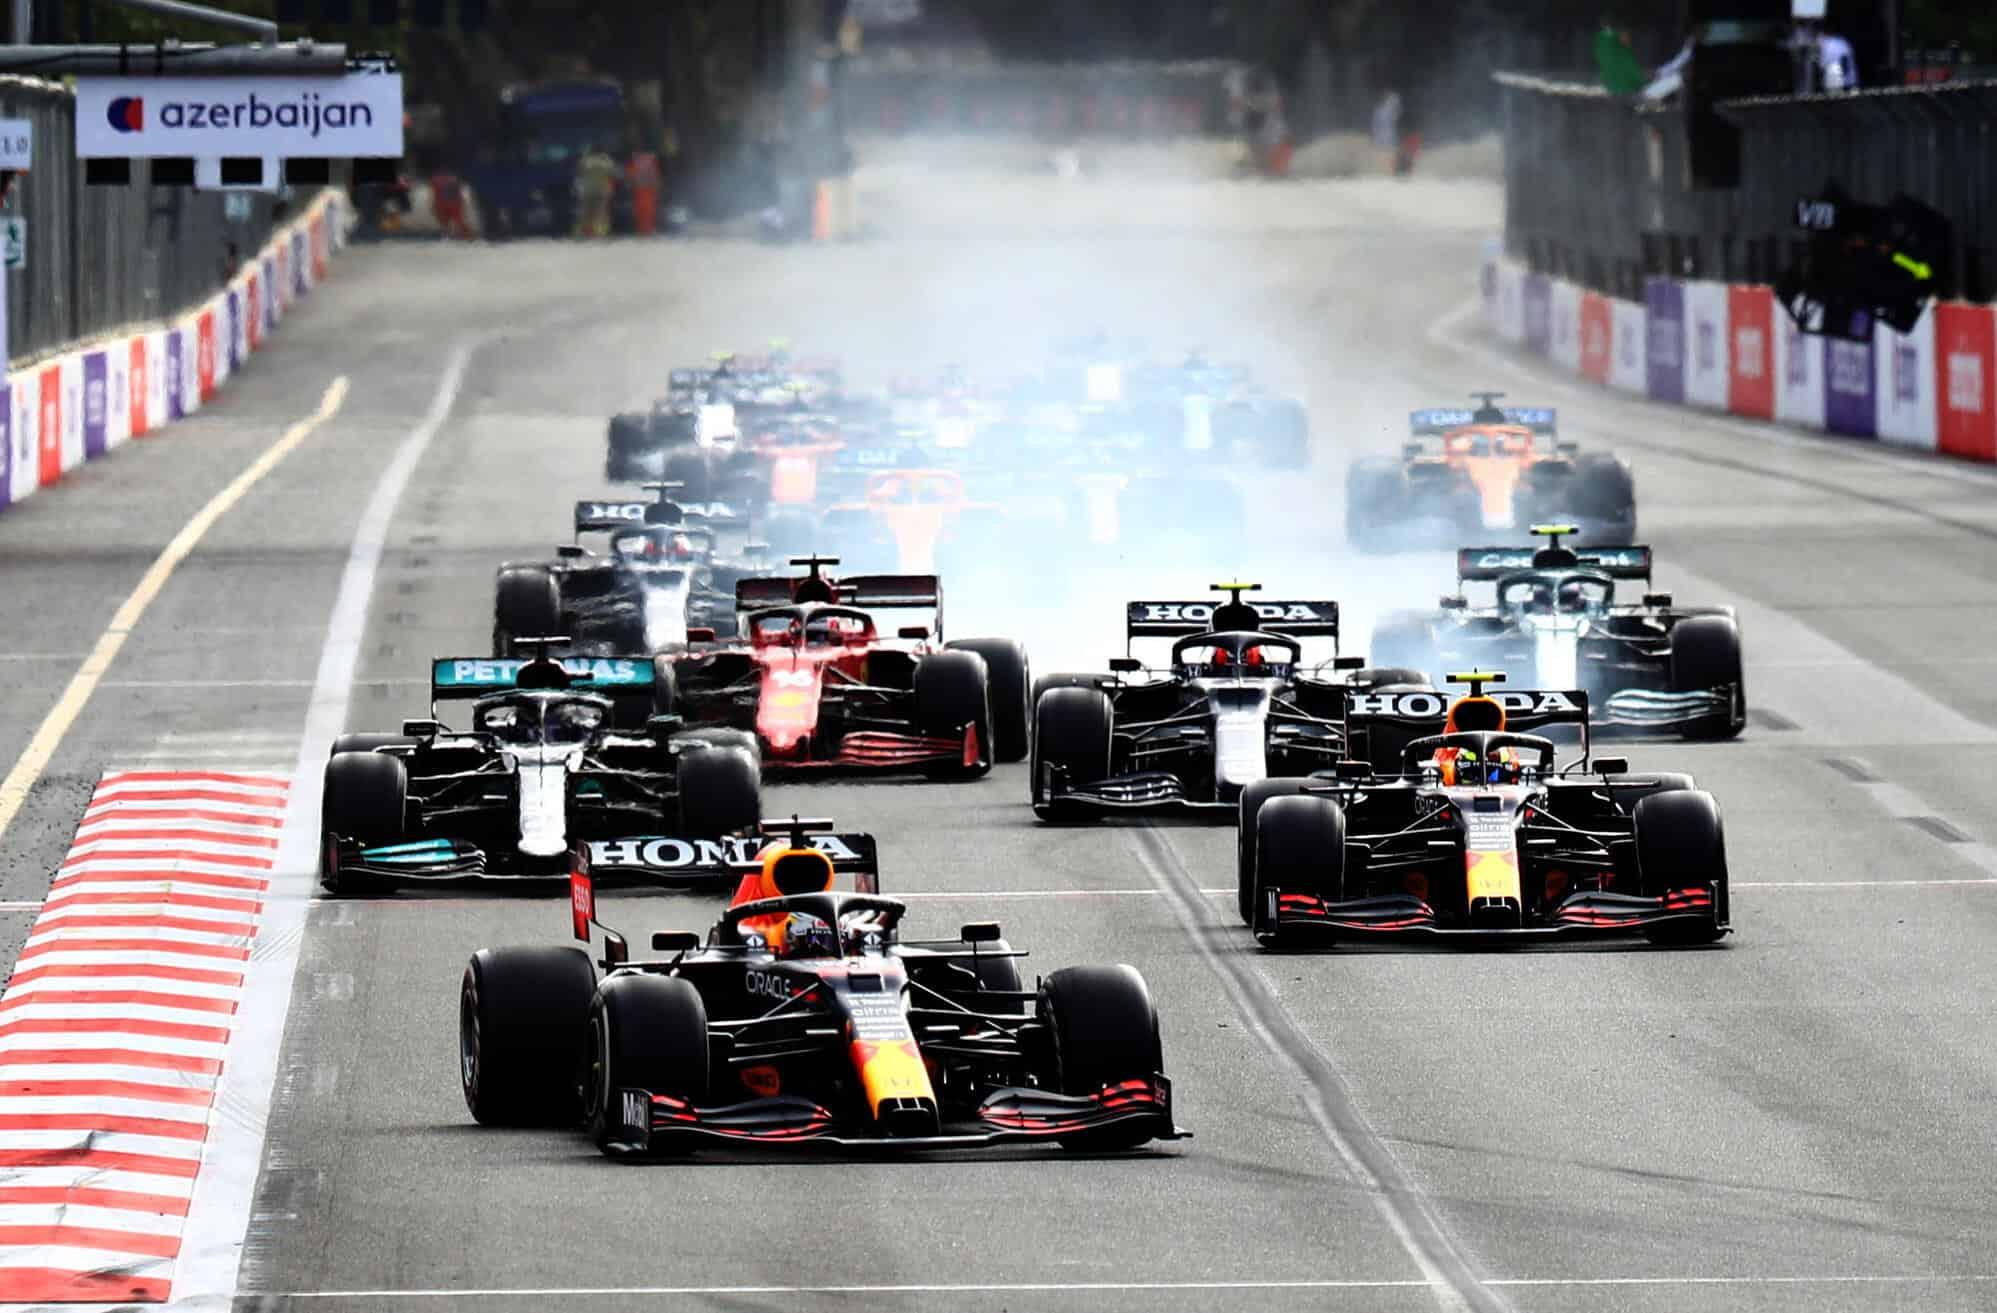 2021 Azerbaijan GP start Photo Red Bull